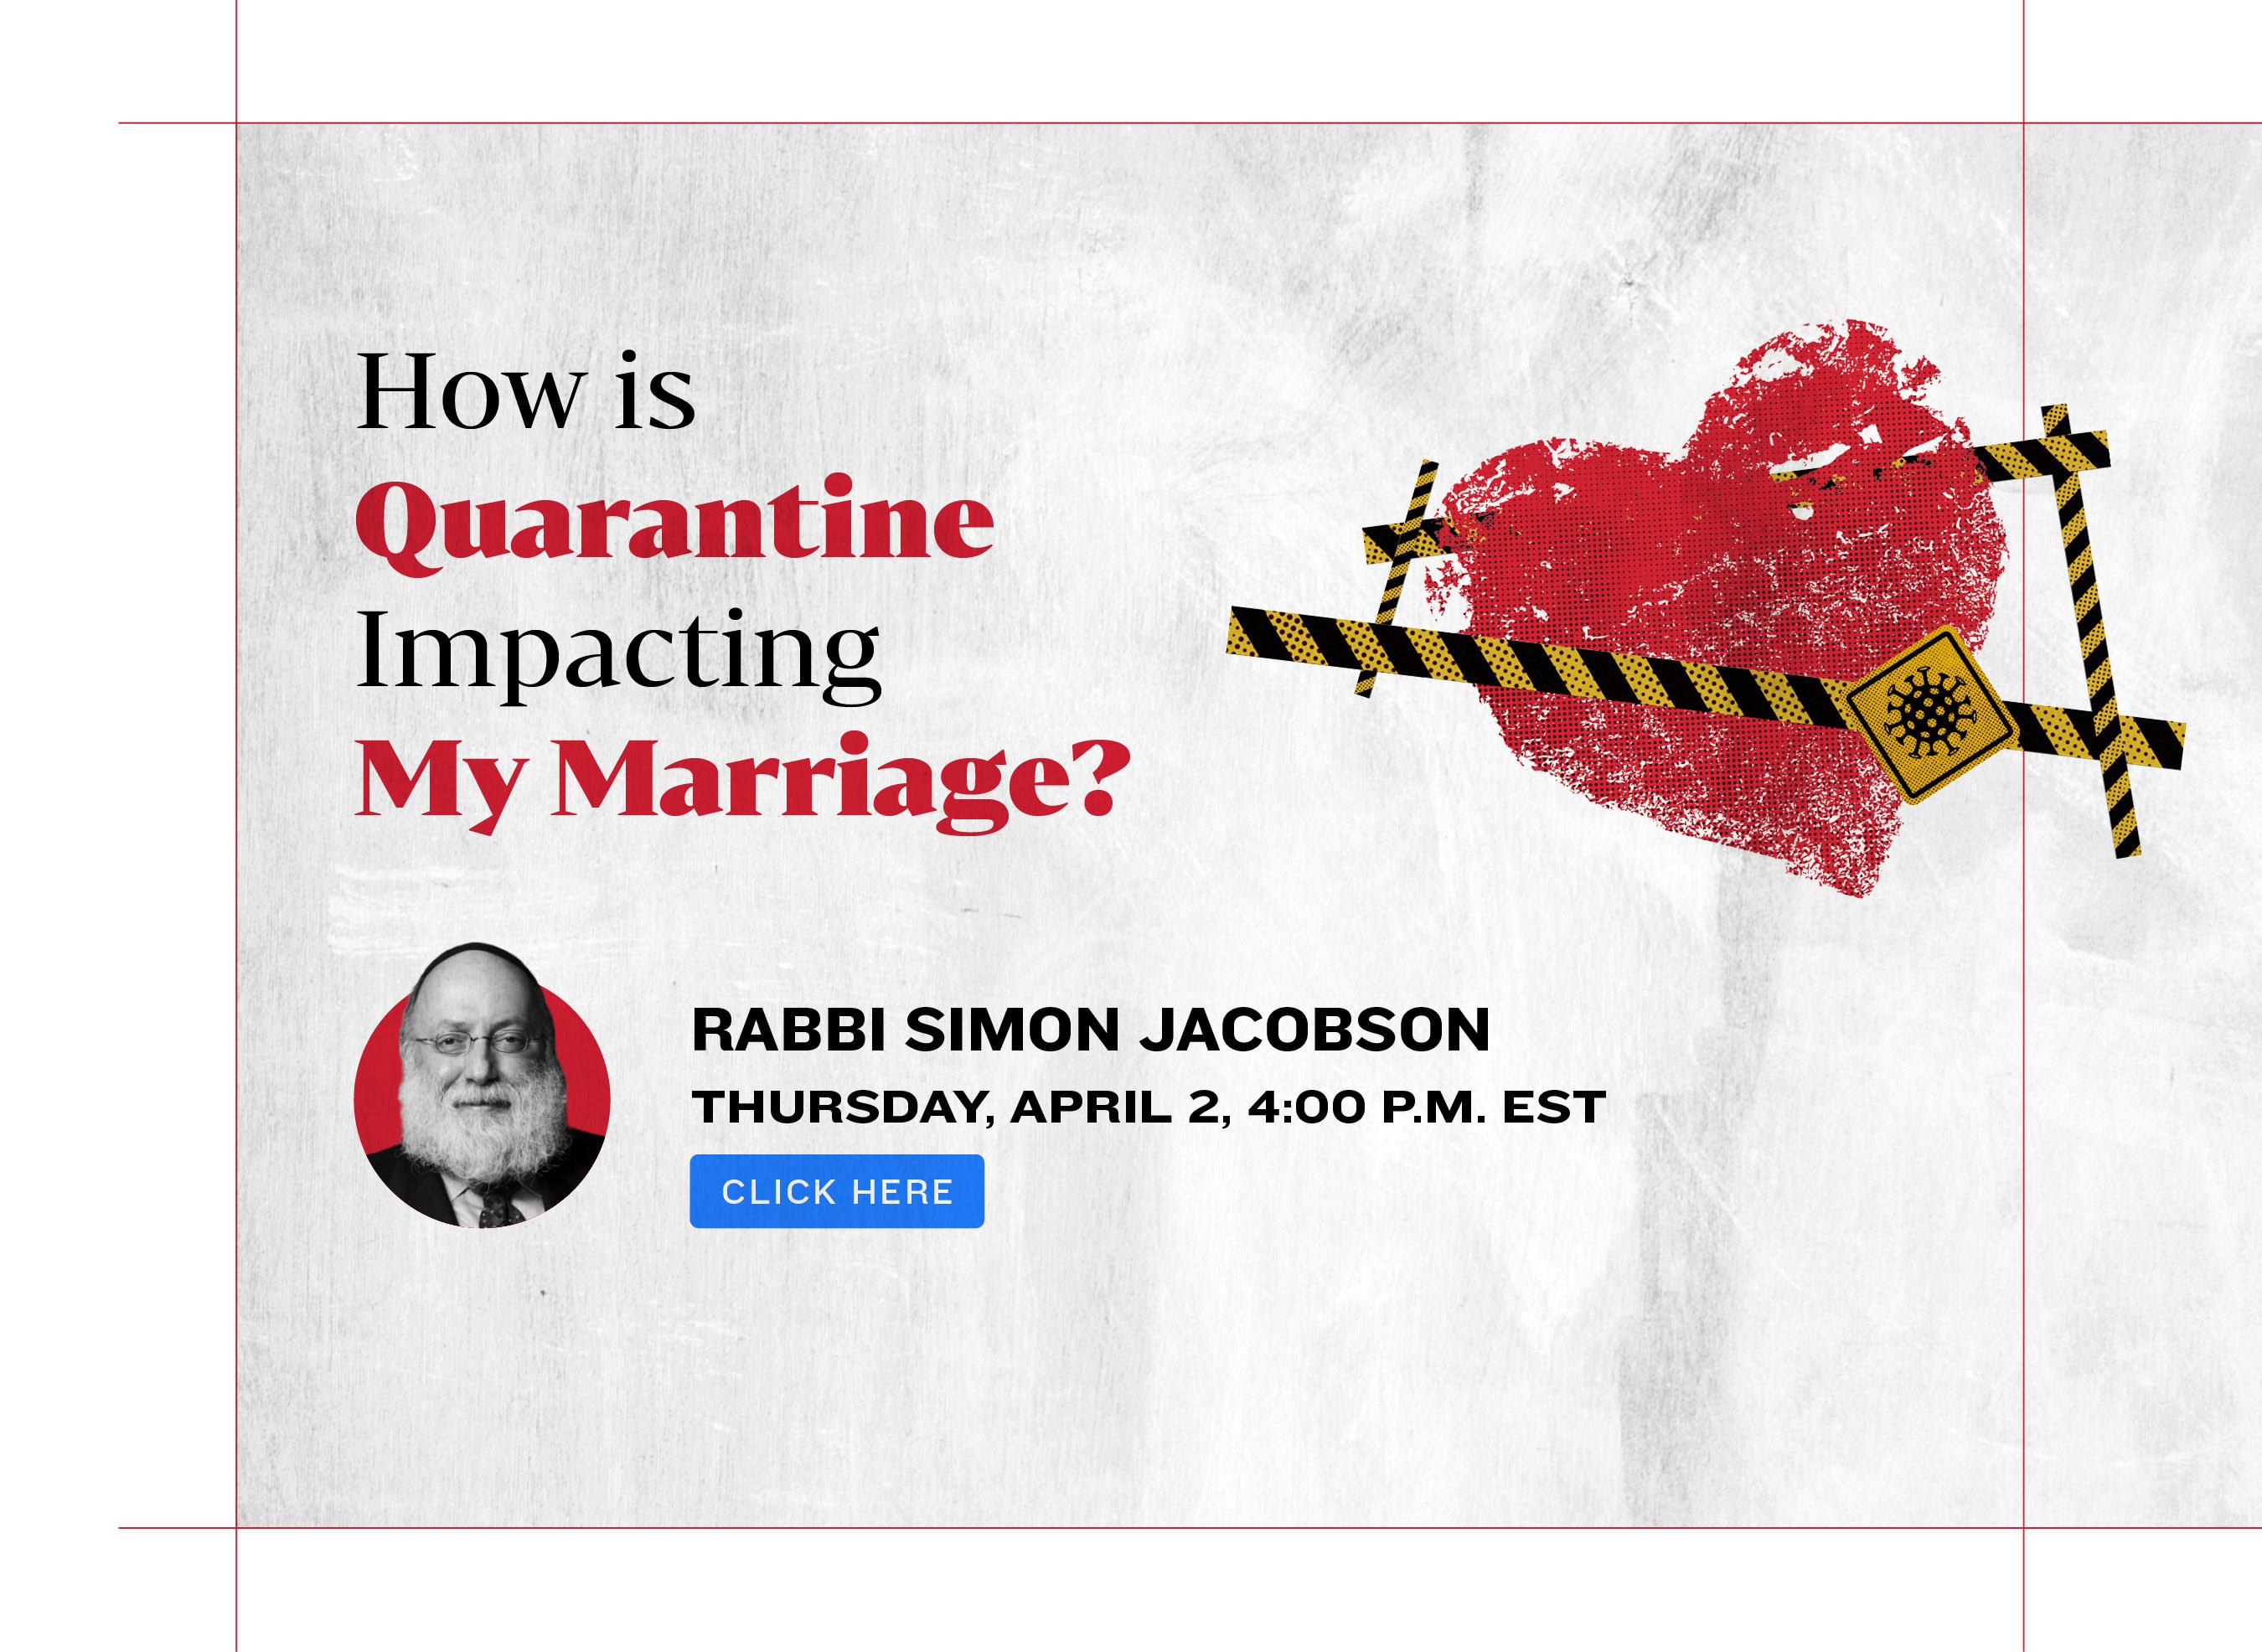 How is Quarantine Impacting My Marriage. Rabbi Simon Jacobson